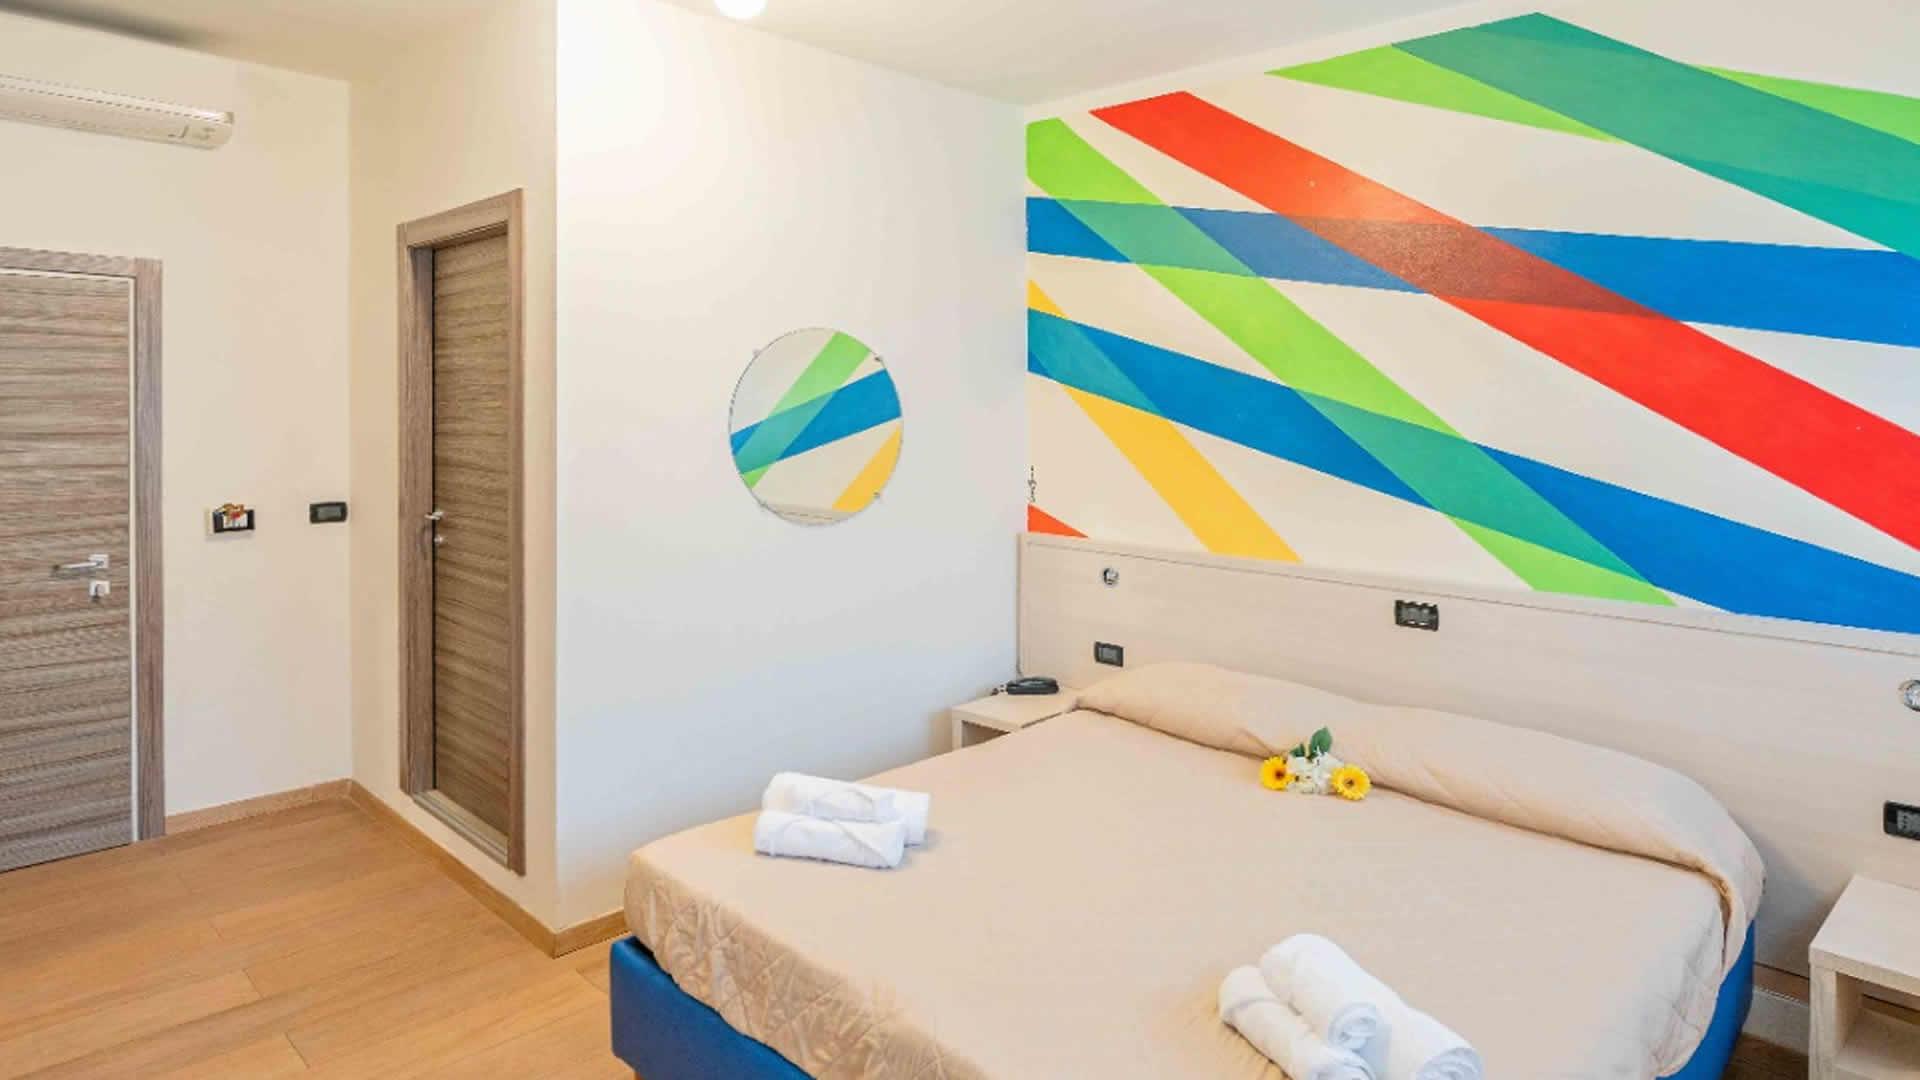 Genova hotel cairoli albergo centro acquario porto antico for Design hotel genova